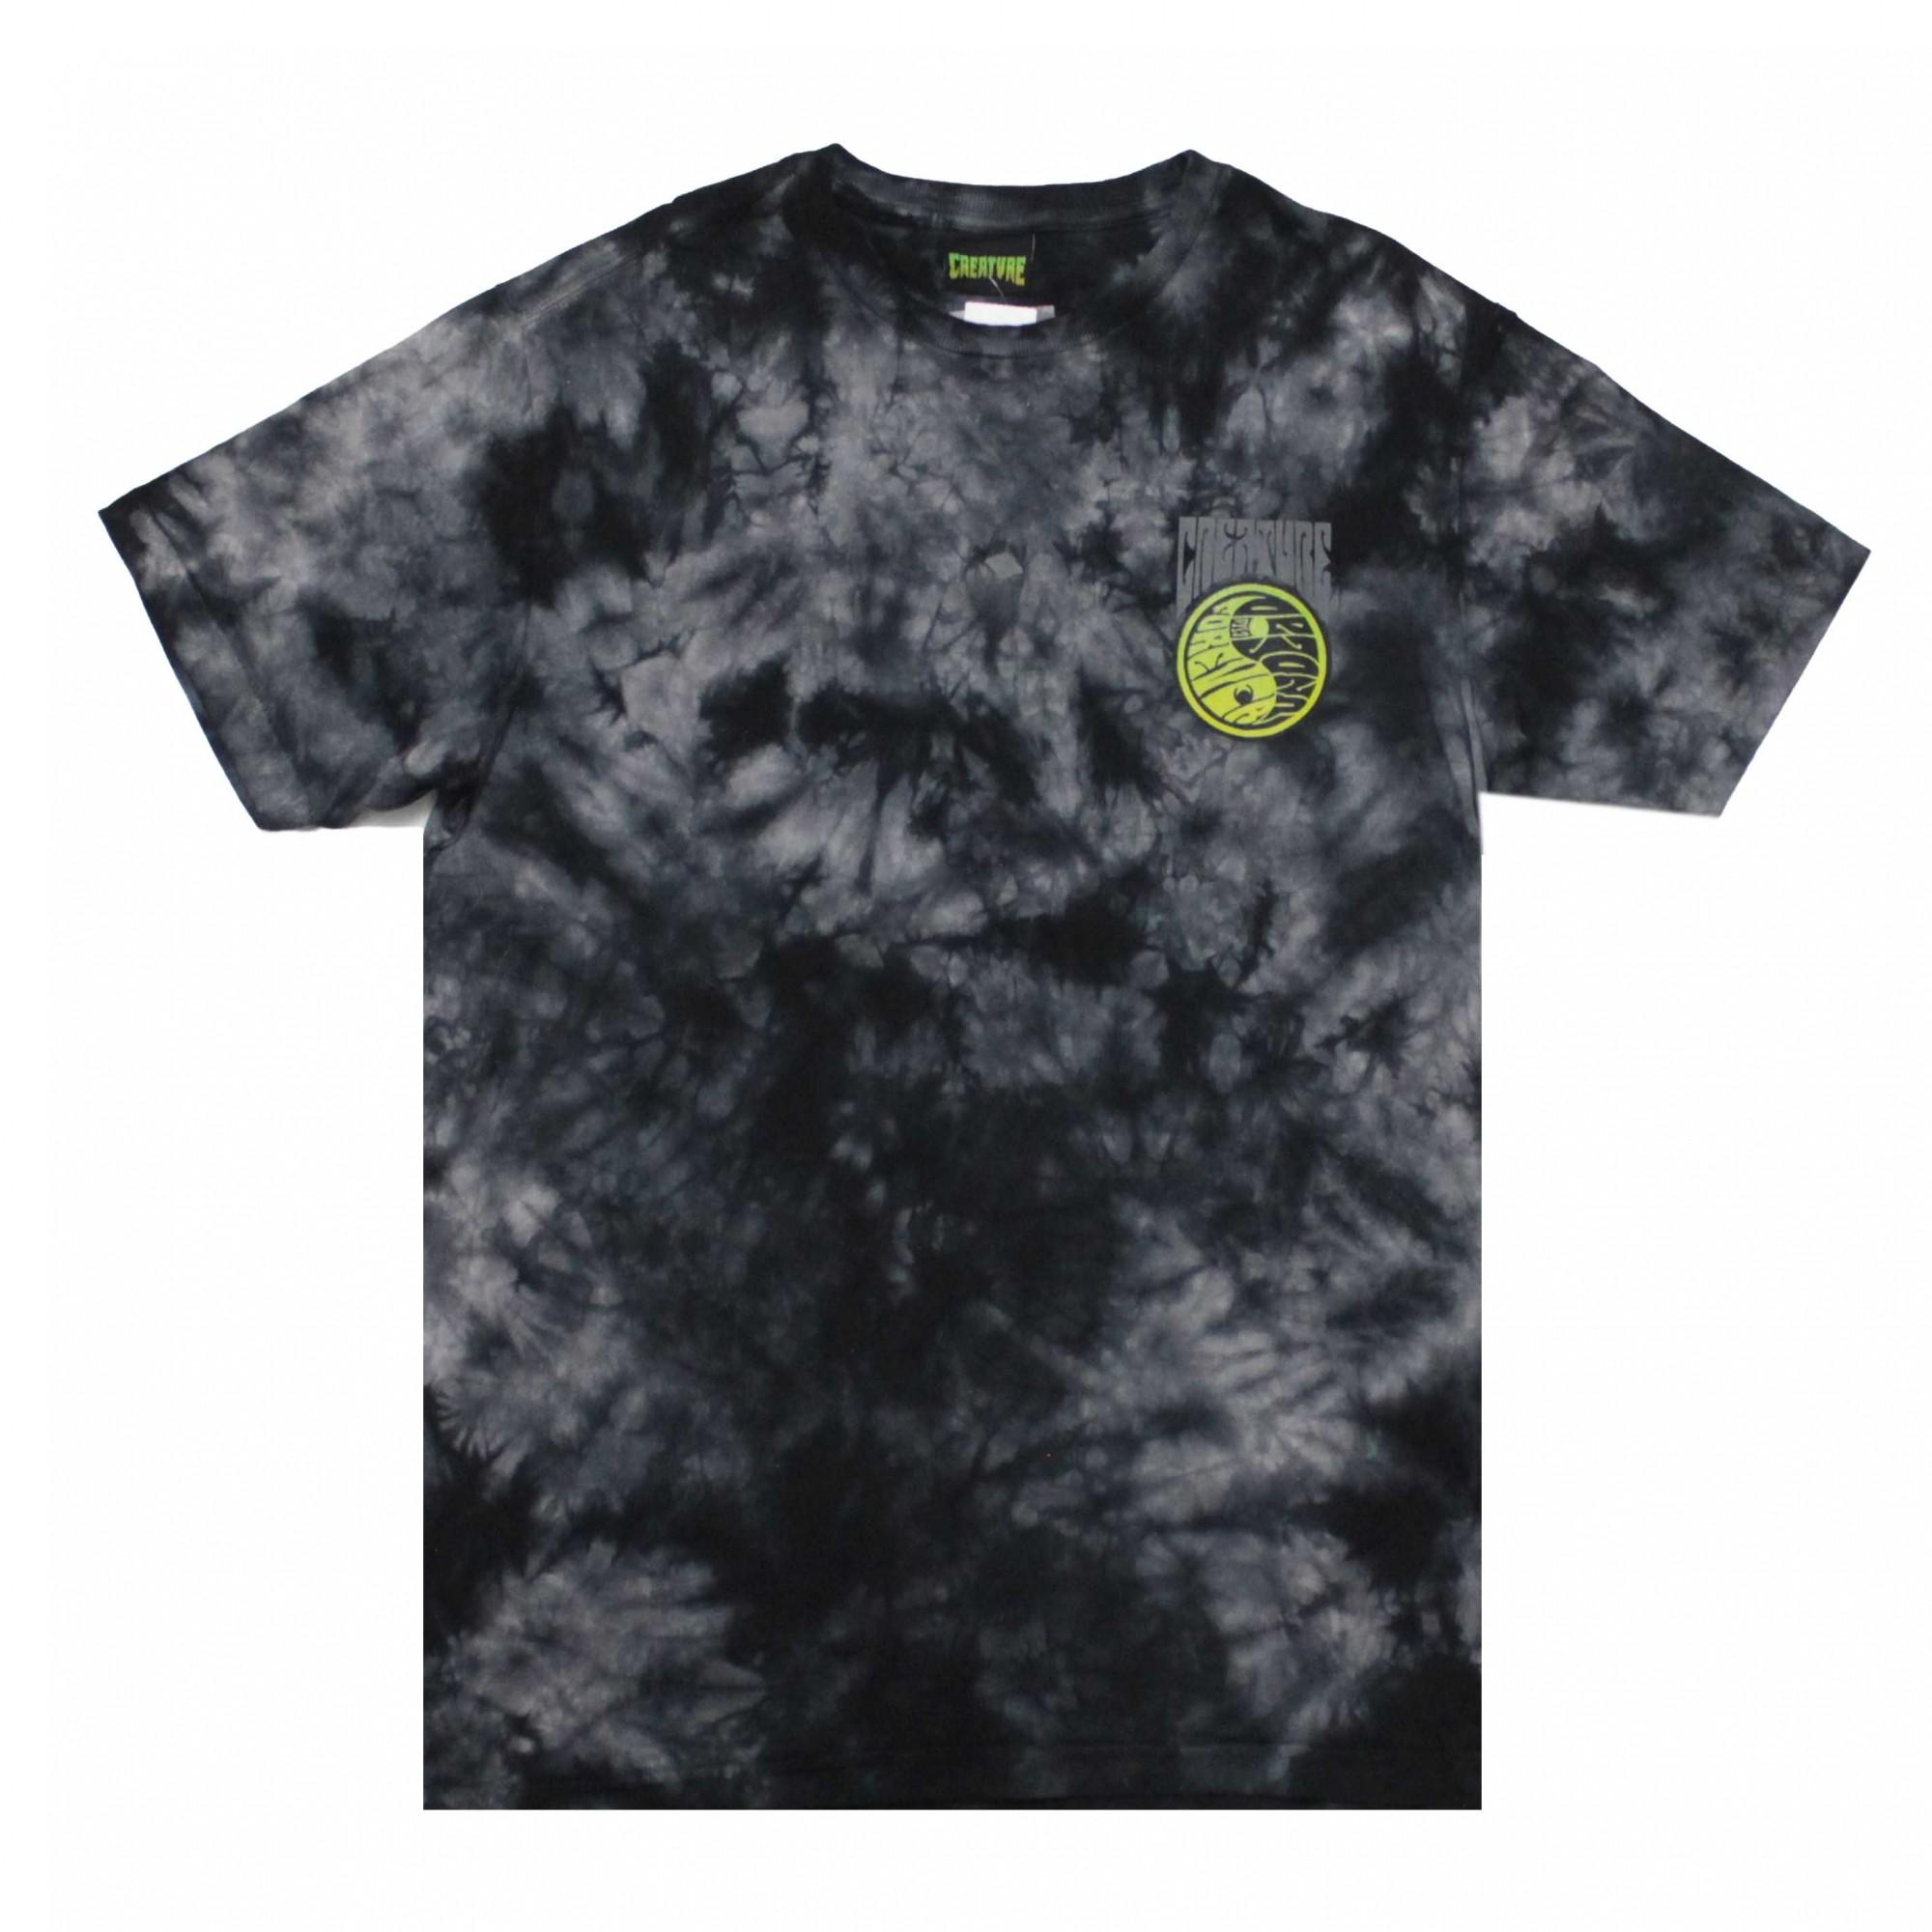 Camiseta Creature Yanger - Tie Dye Preto